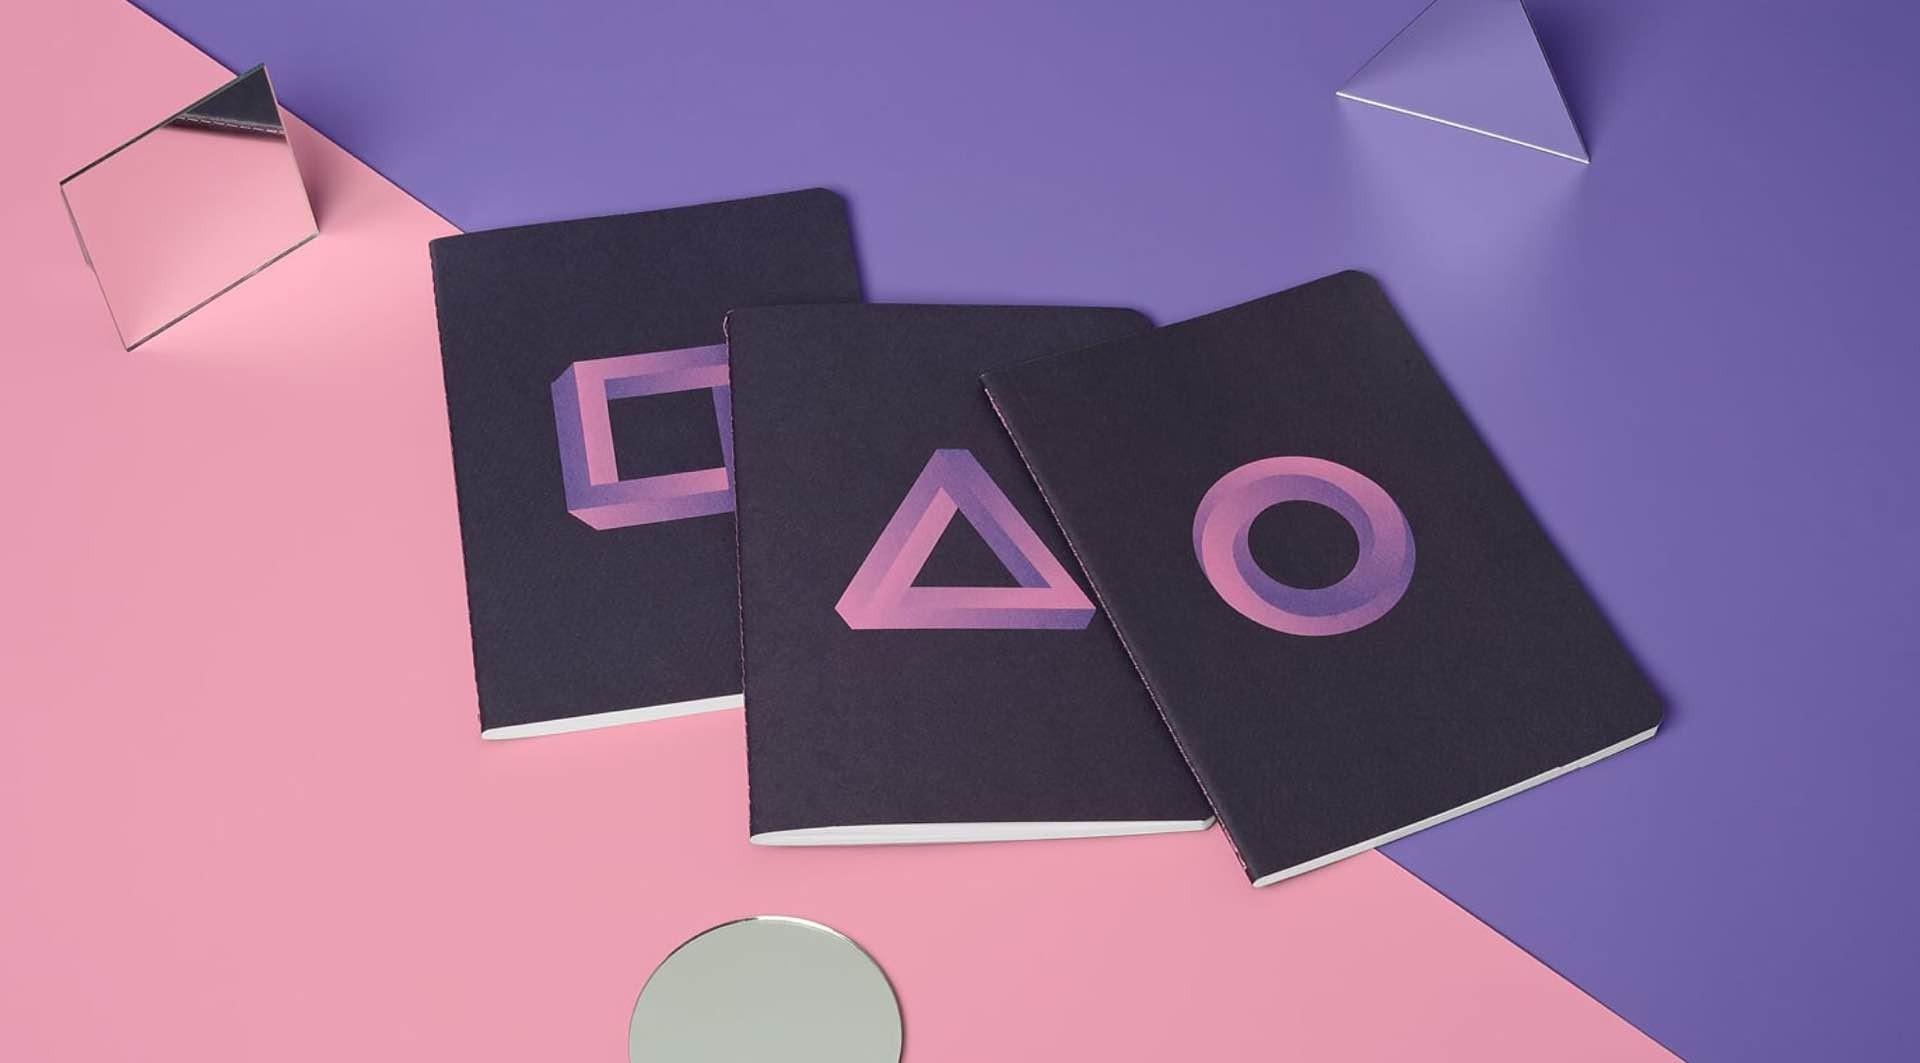 baron-fig-infinity-vanguard-notebooks